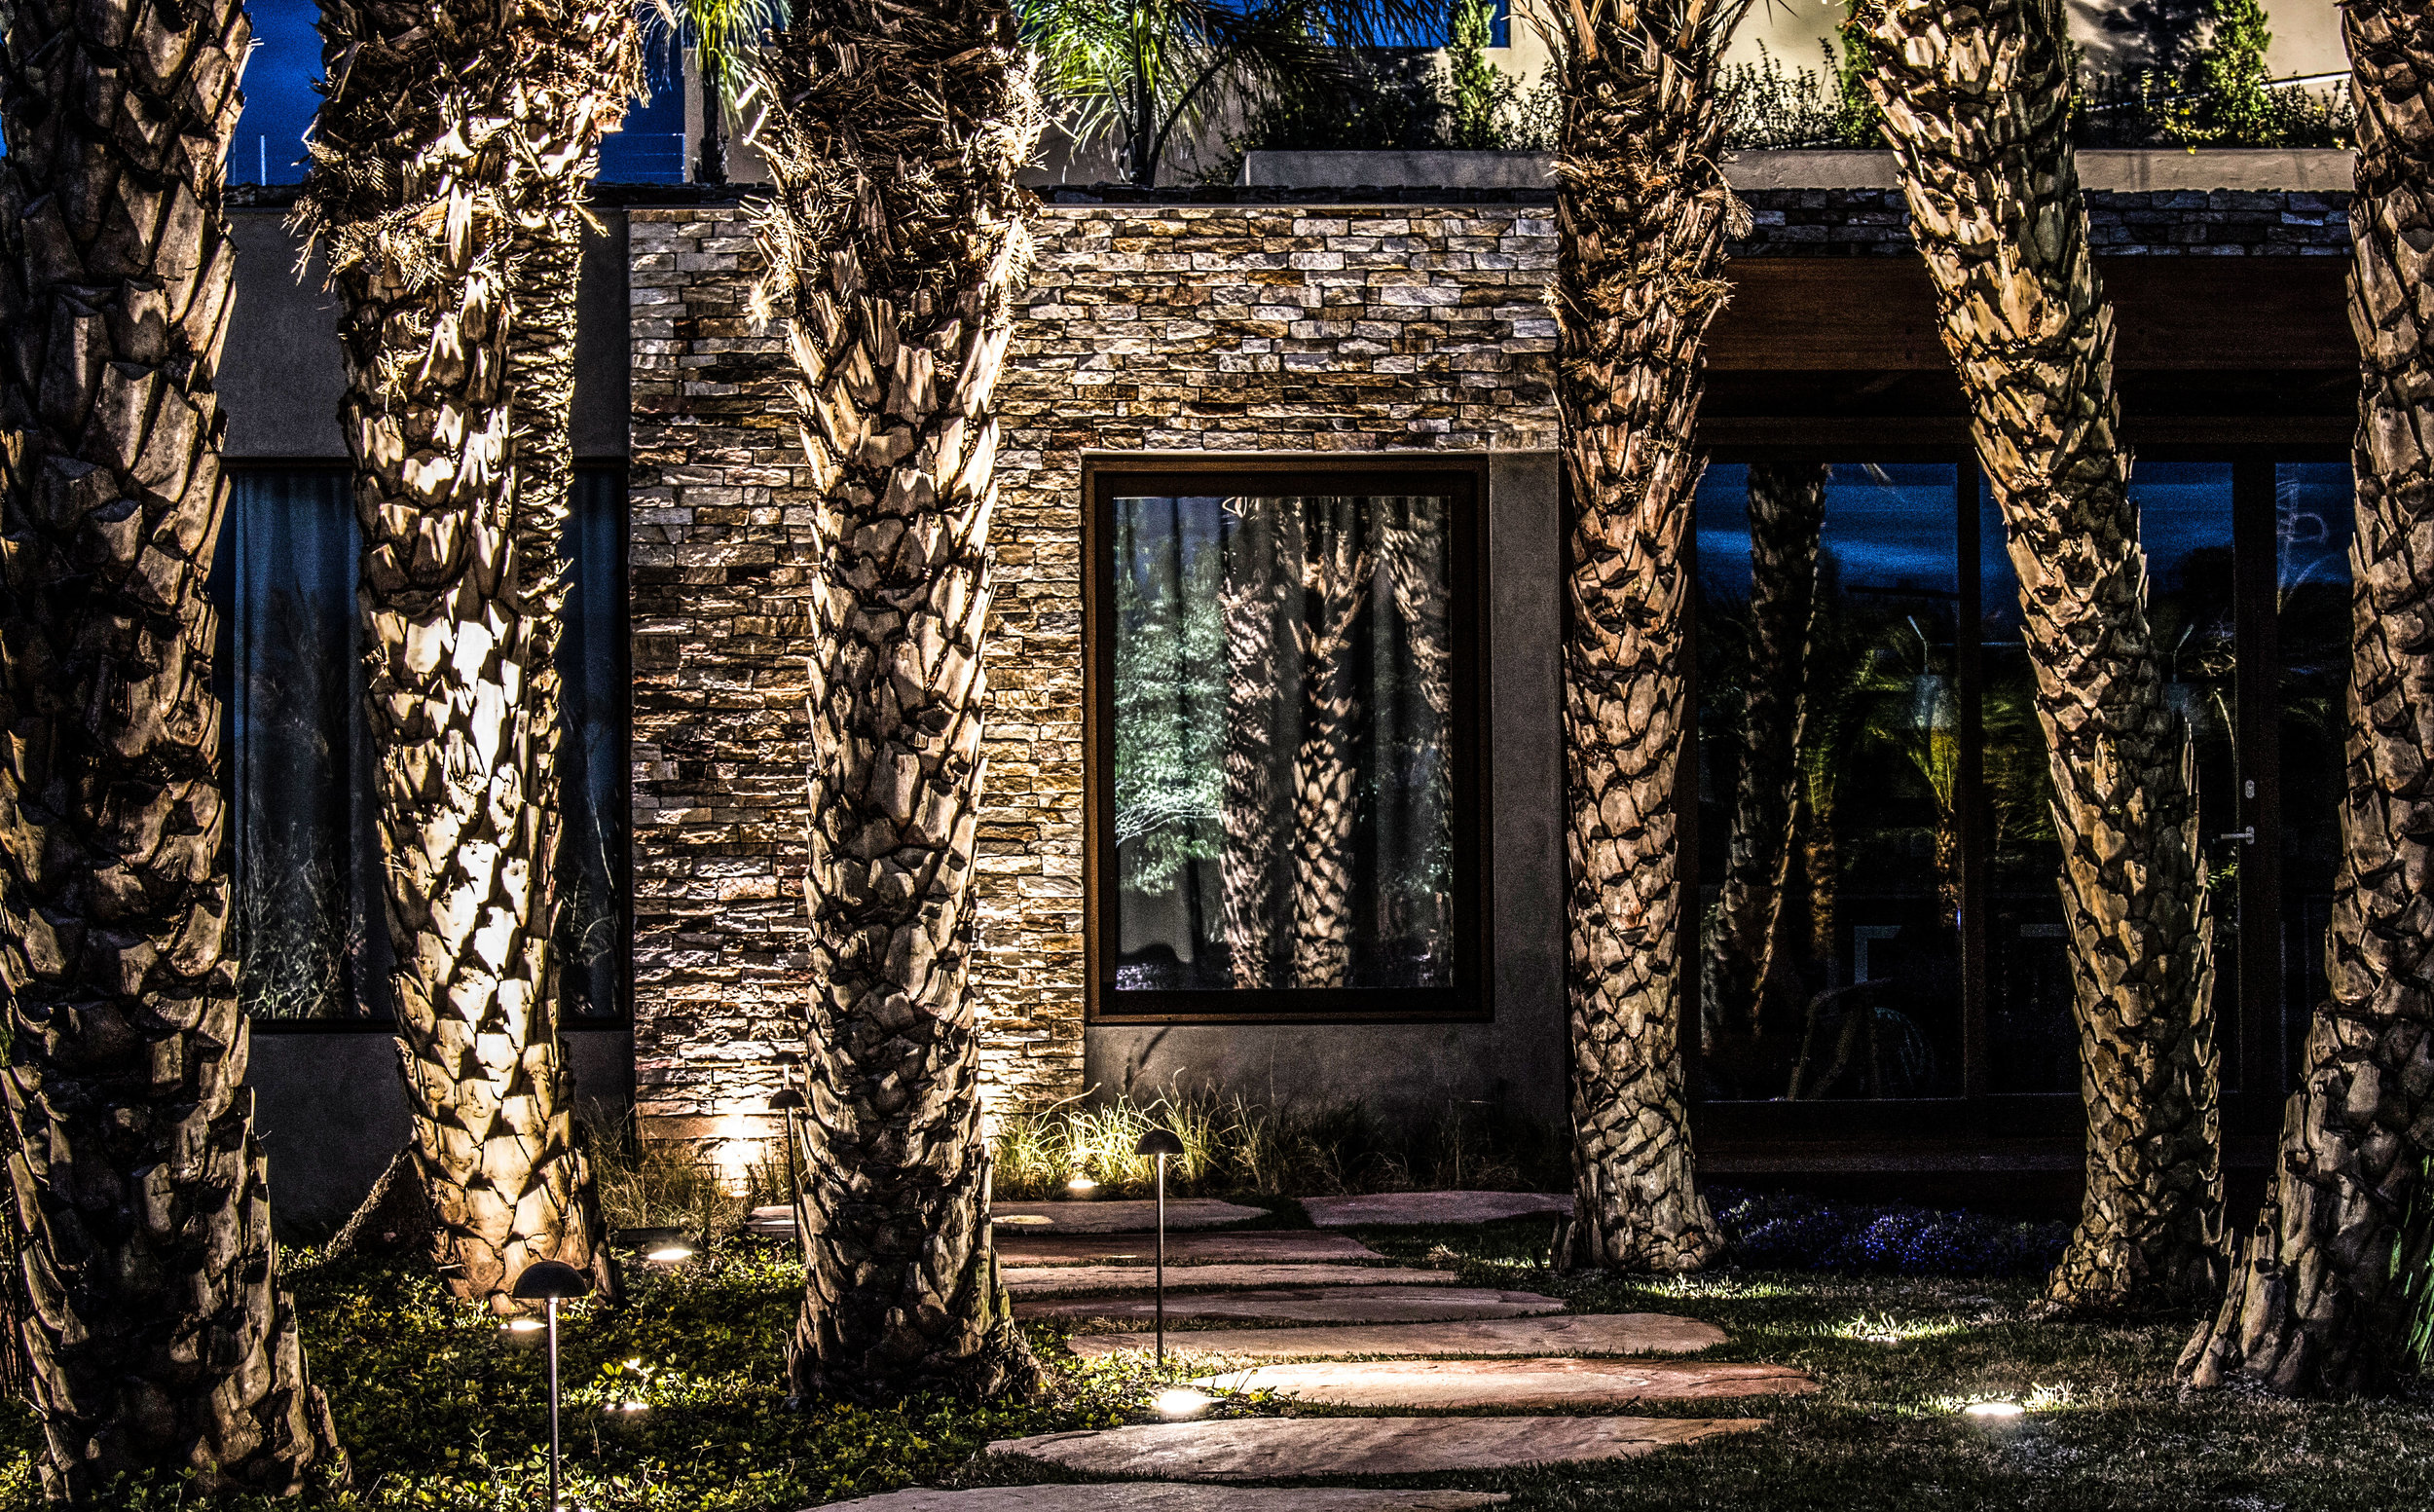 LIGHTSOURCE_Residencia-Campos-do-Jordao _ LC-Orsini_Abbud-Aguiar_002.jpg